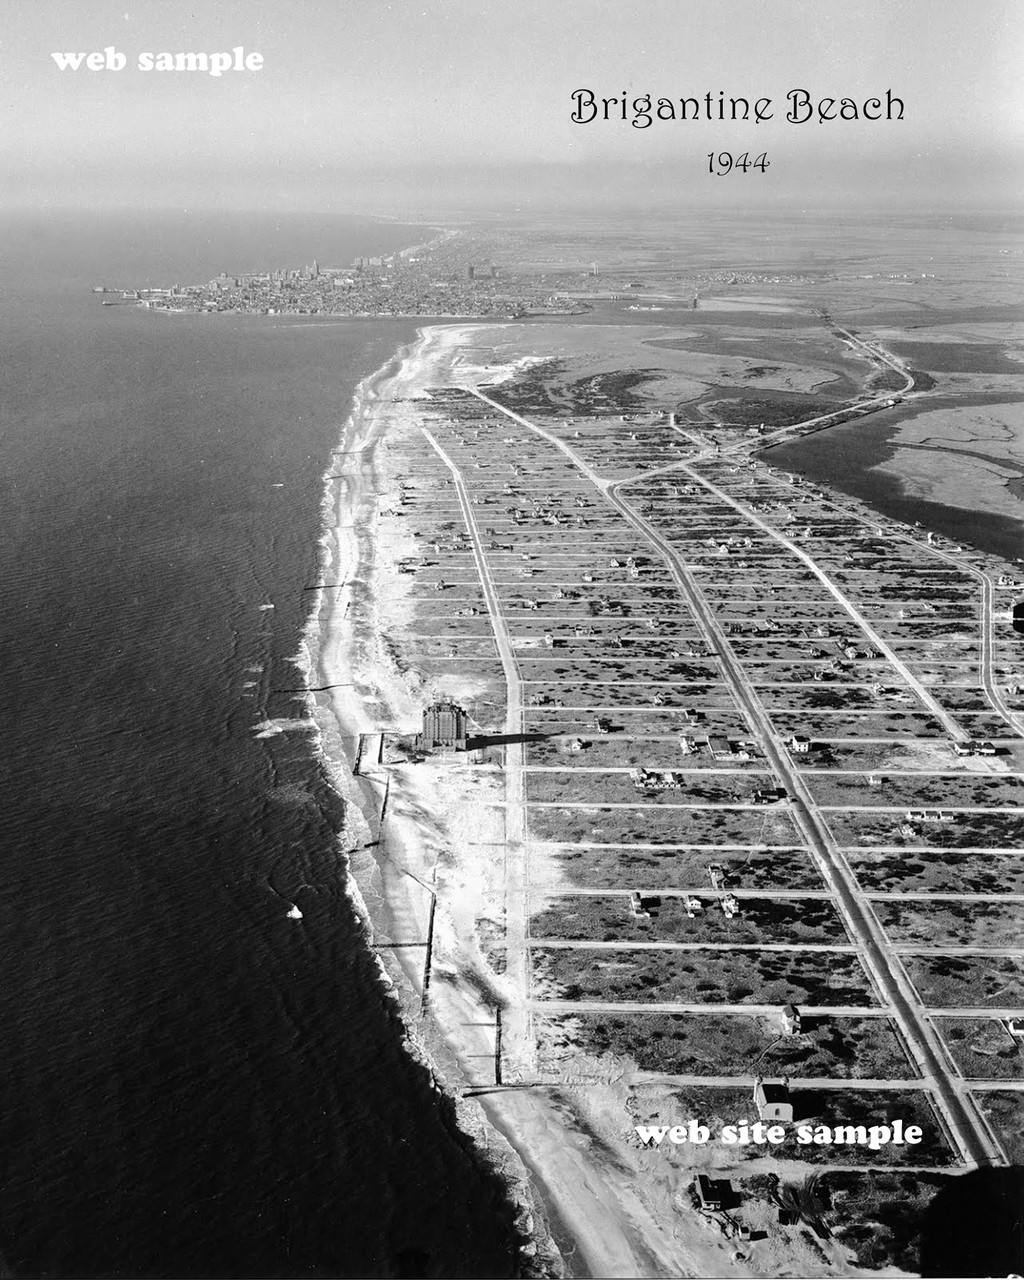 Brigantine Beach Aerial photograph